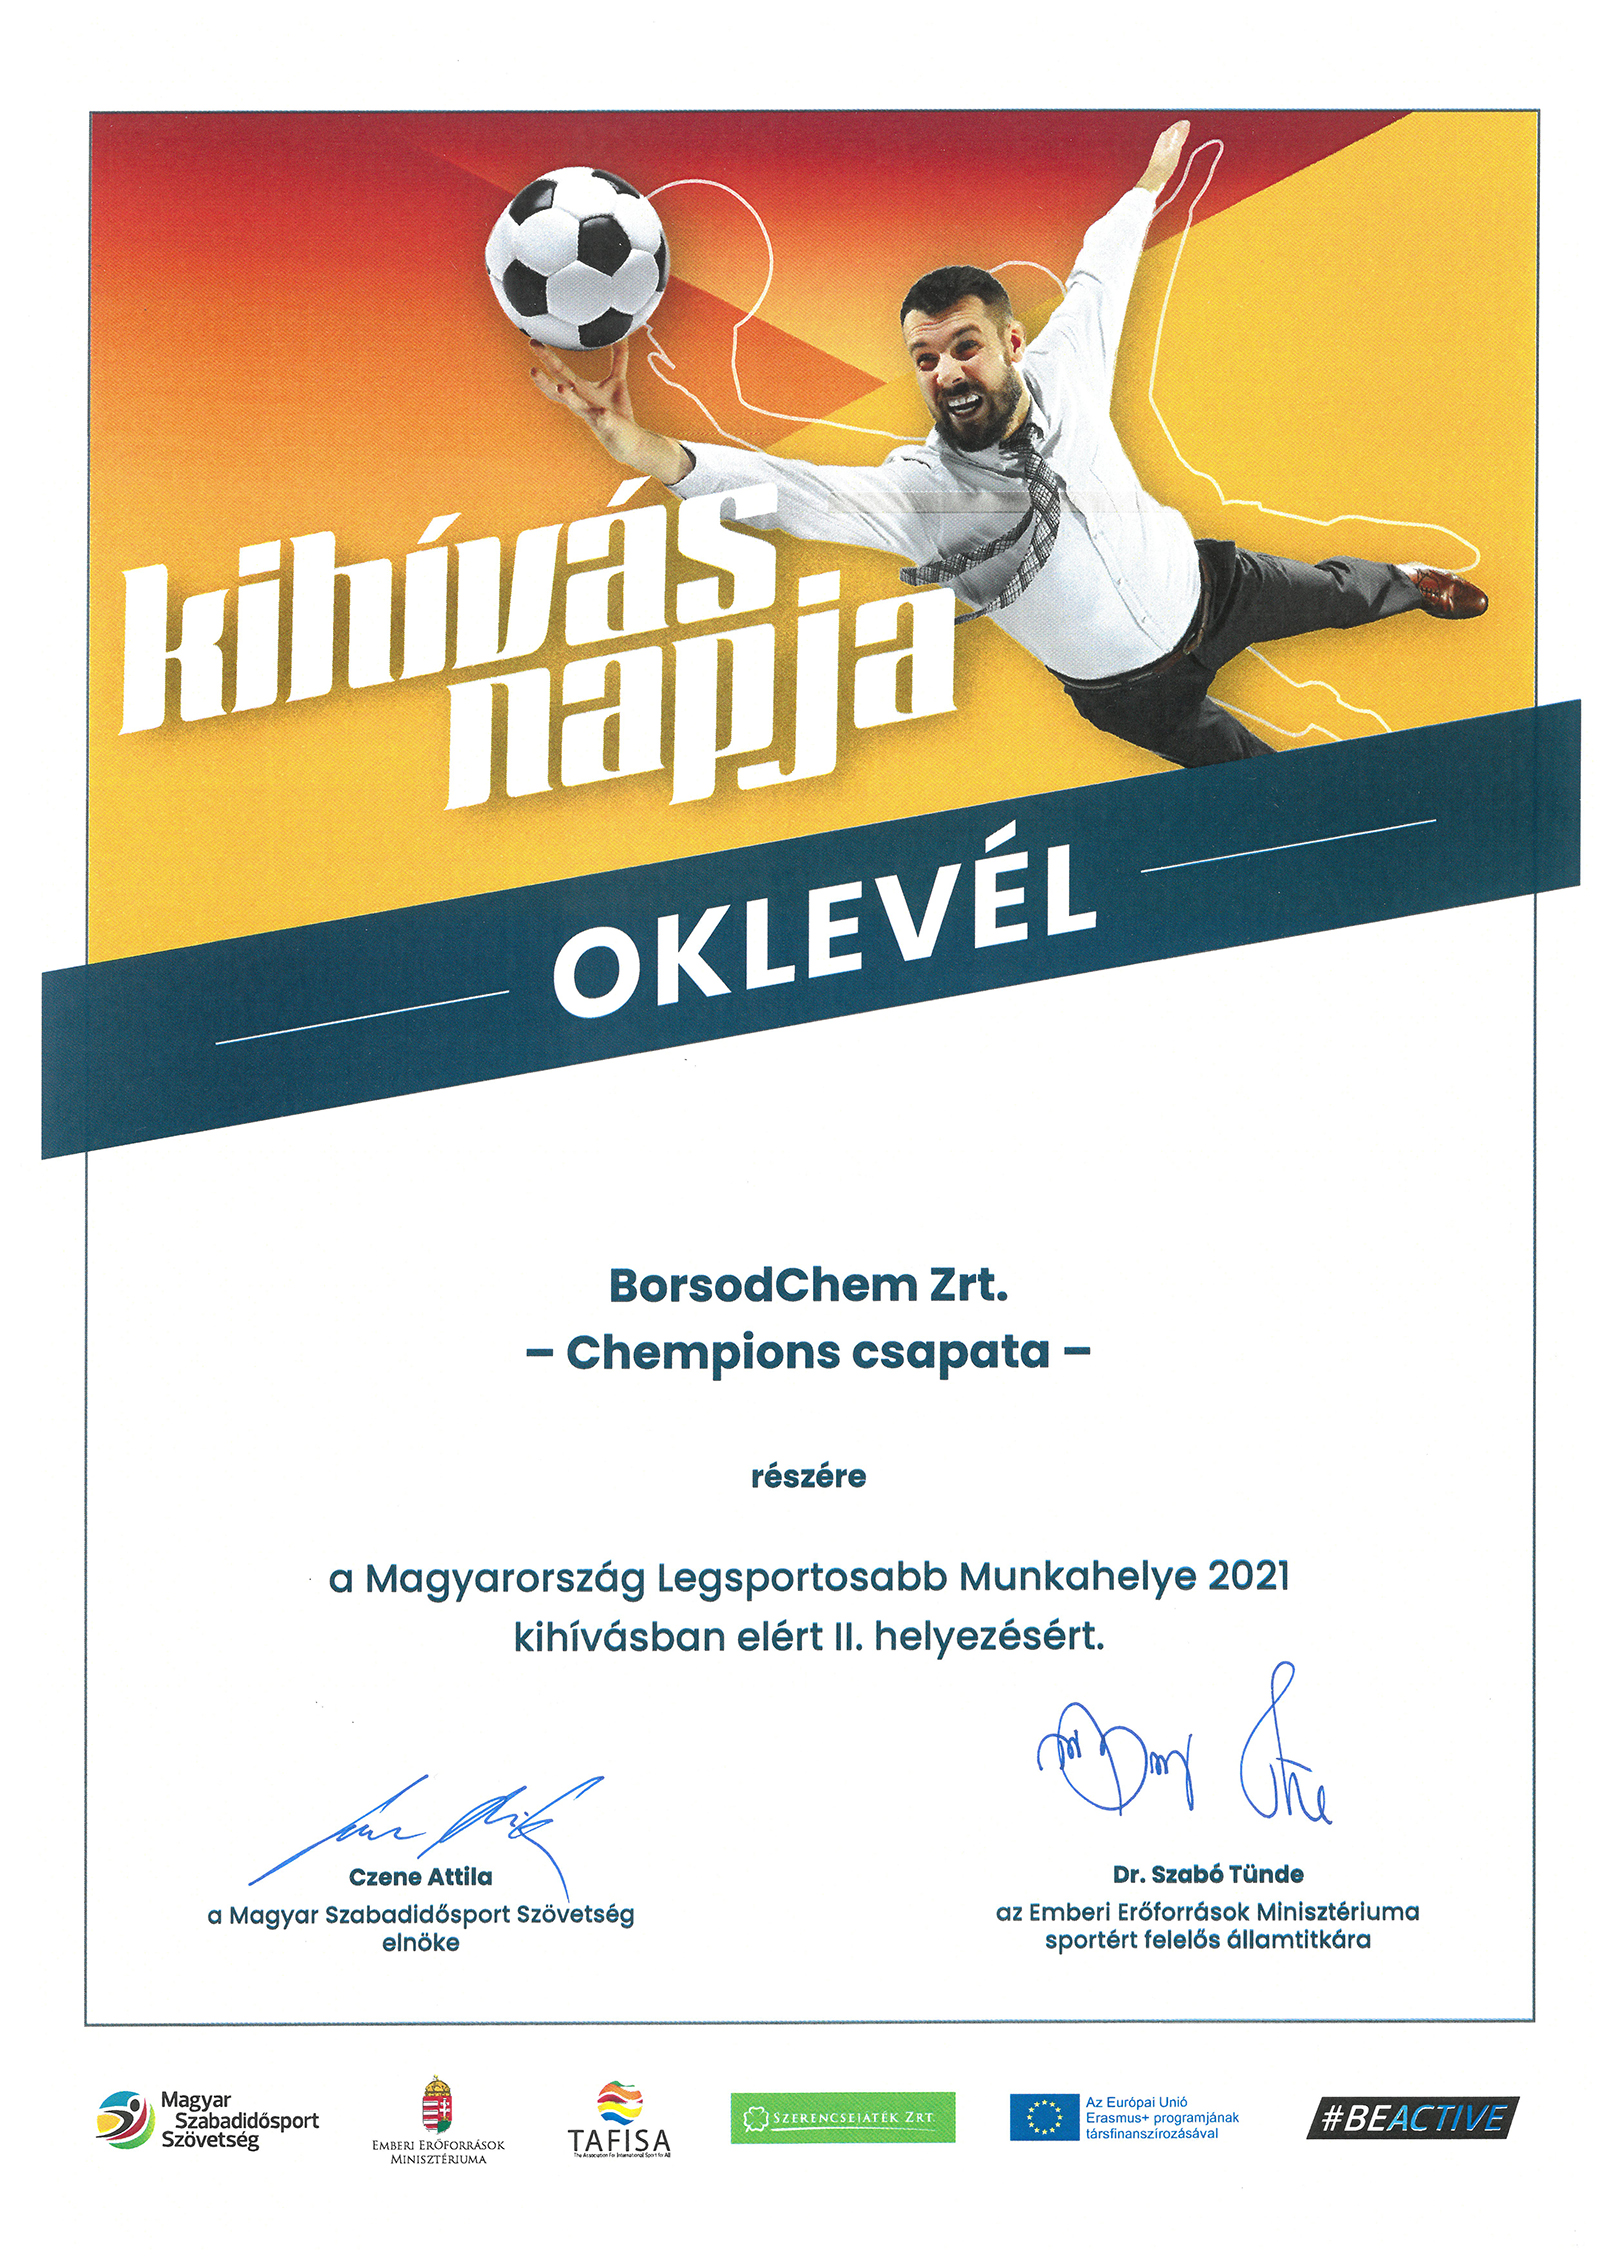 Kihivas_napja_oklevel_2021_LR